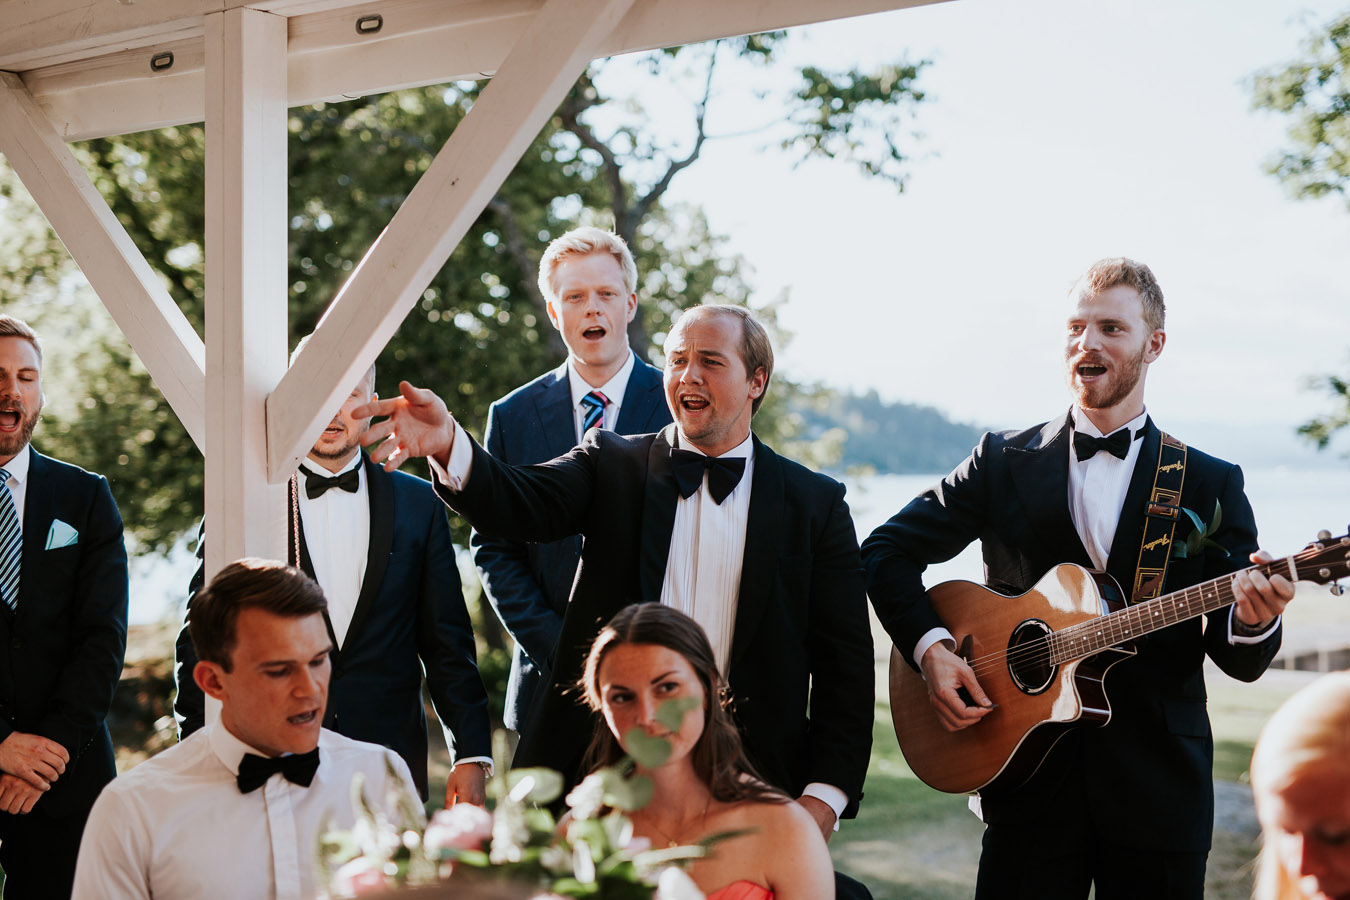 Fotograf-Tone-Tvedt-bryllup-162.jpg